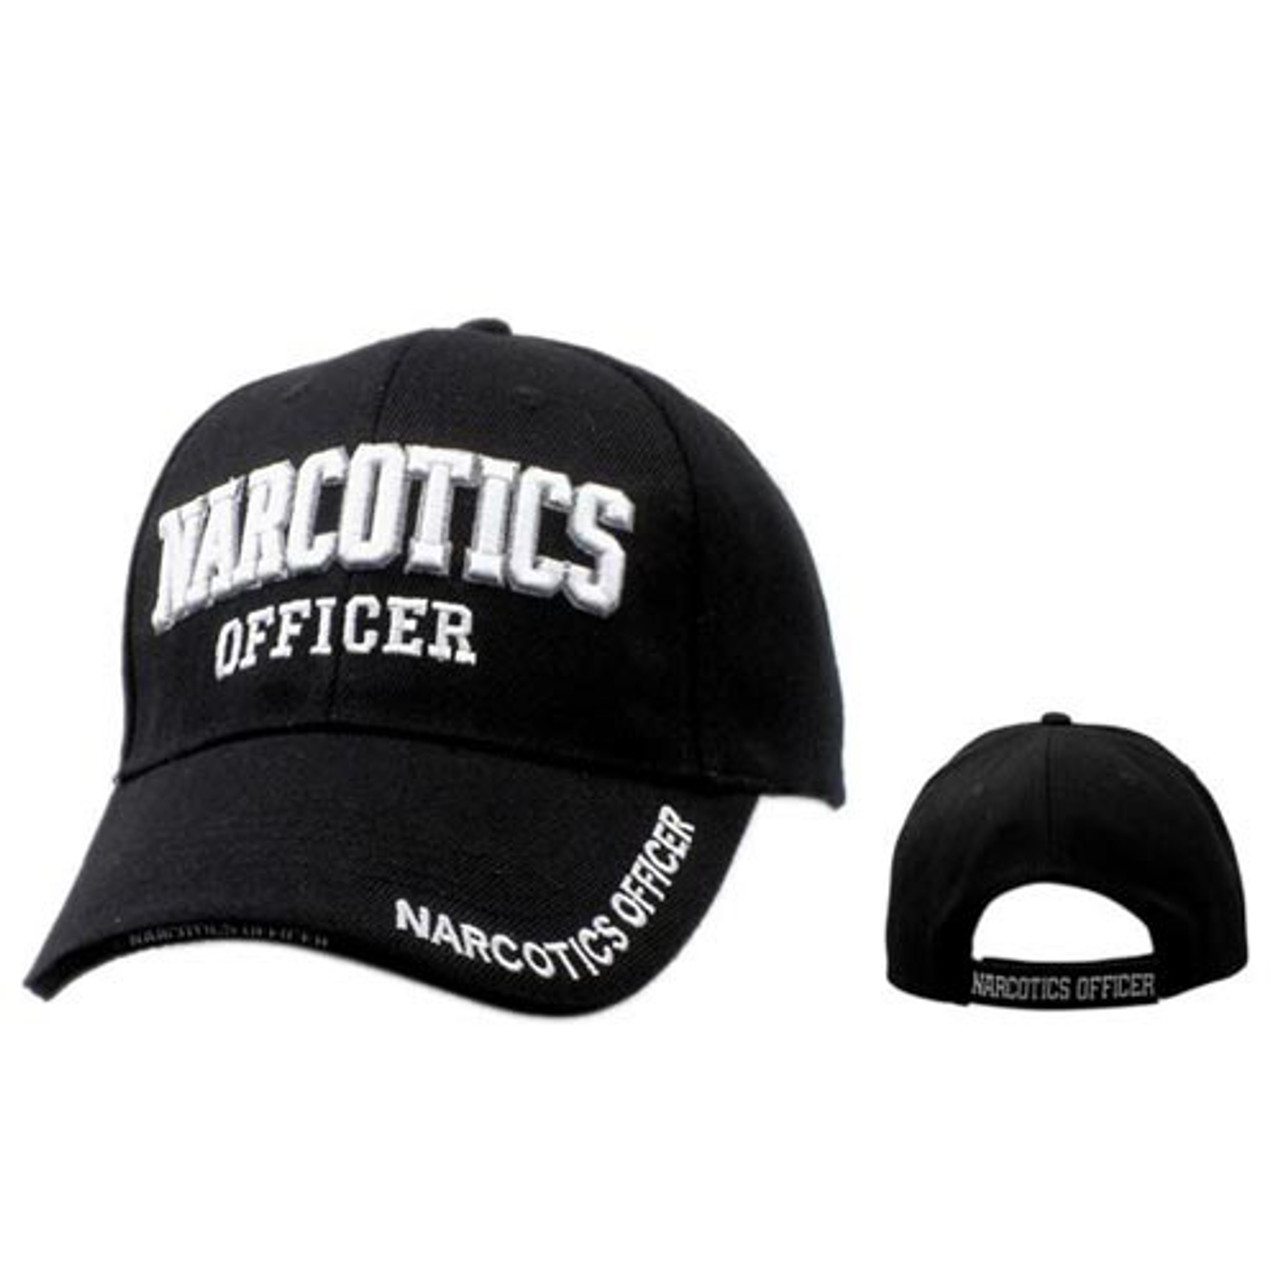 Wholesale Baseball Cap C190 ~ Narcotics Officer